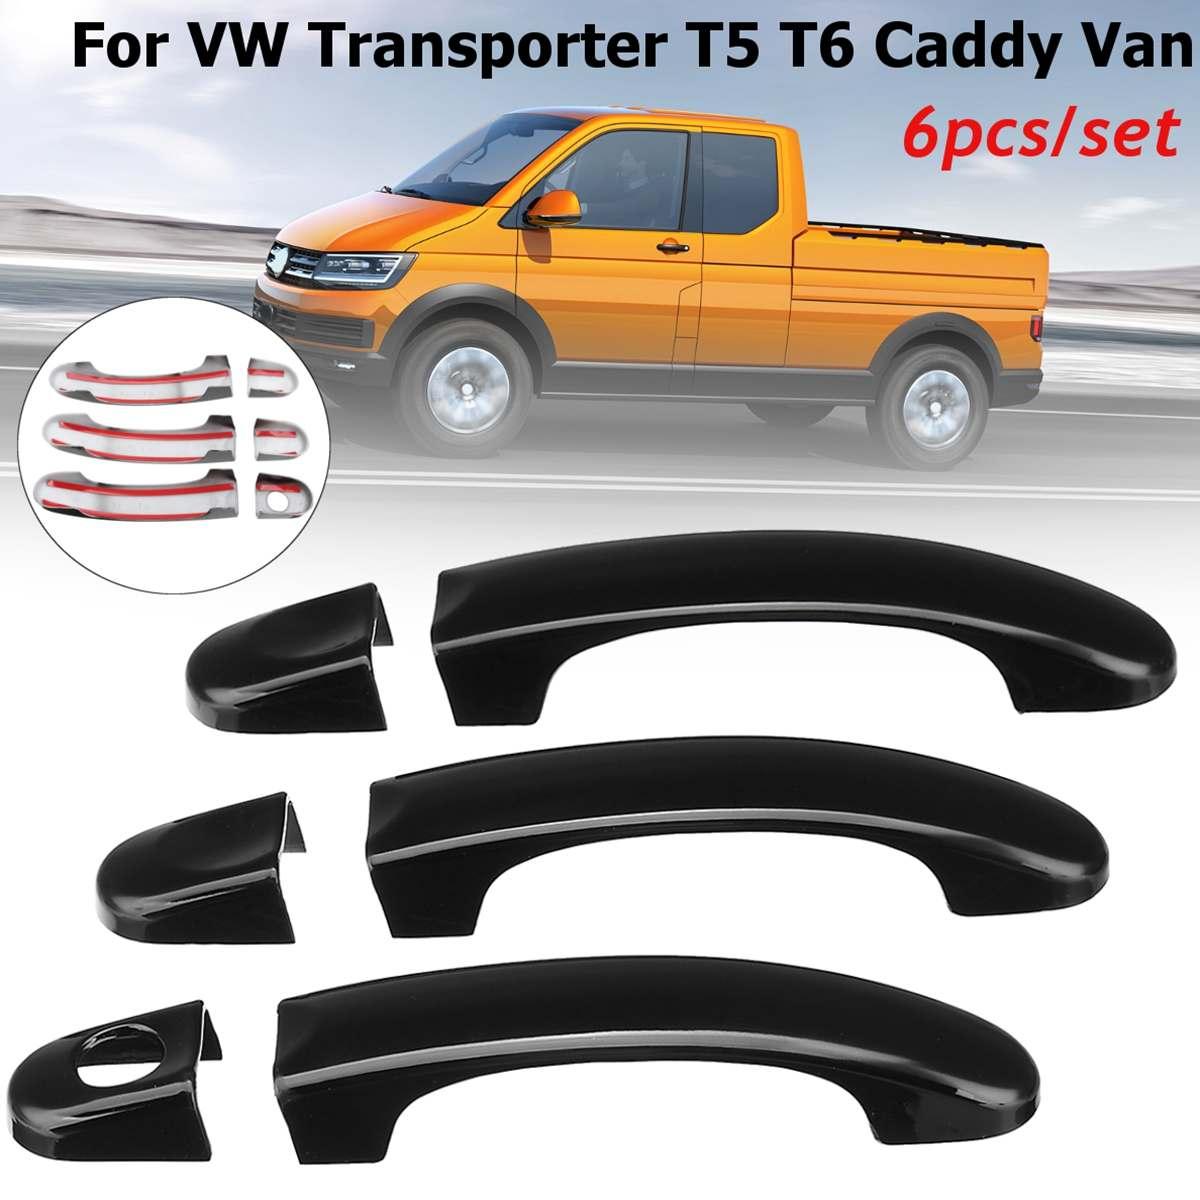 ABS 3/4, cubiertas de molduras para manija de puerta delantera de coche para VW Transporter T5 2003-2015/T6/Caddy/Vans, pegatina para puerta Exterior